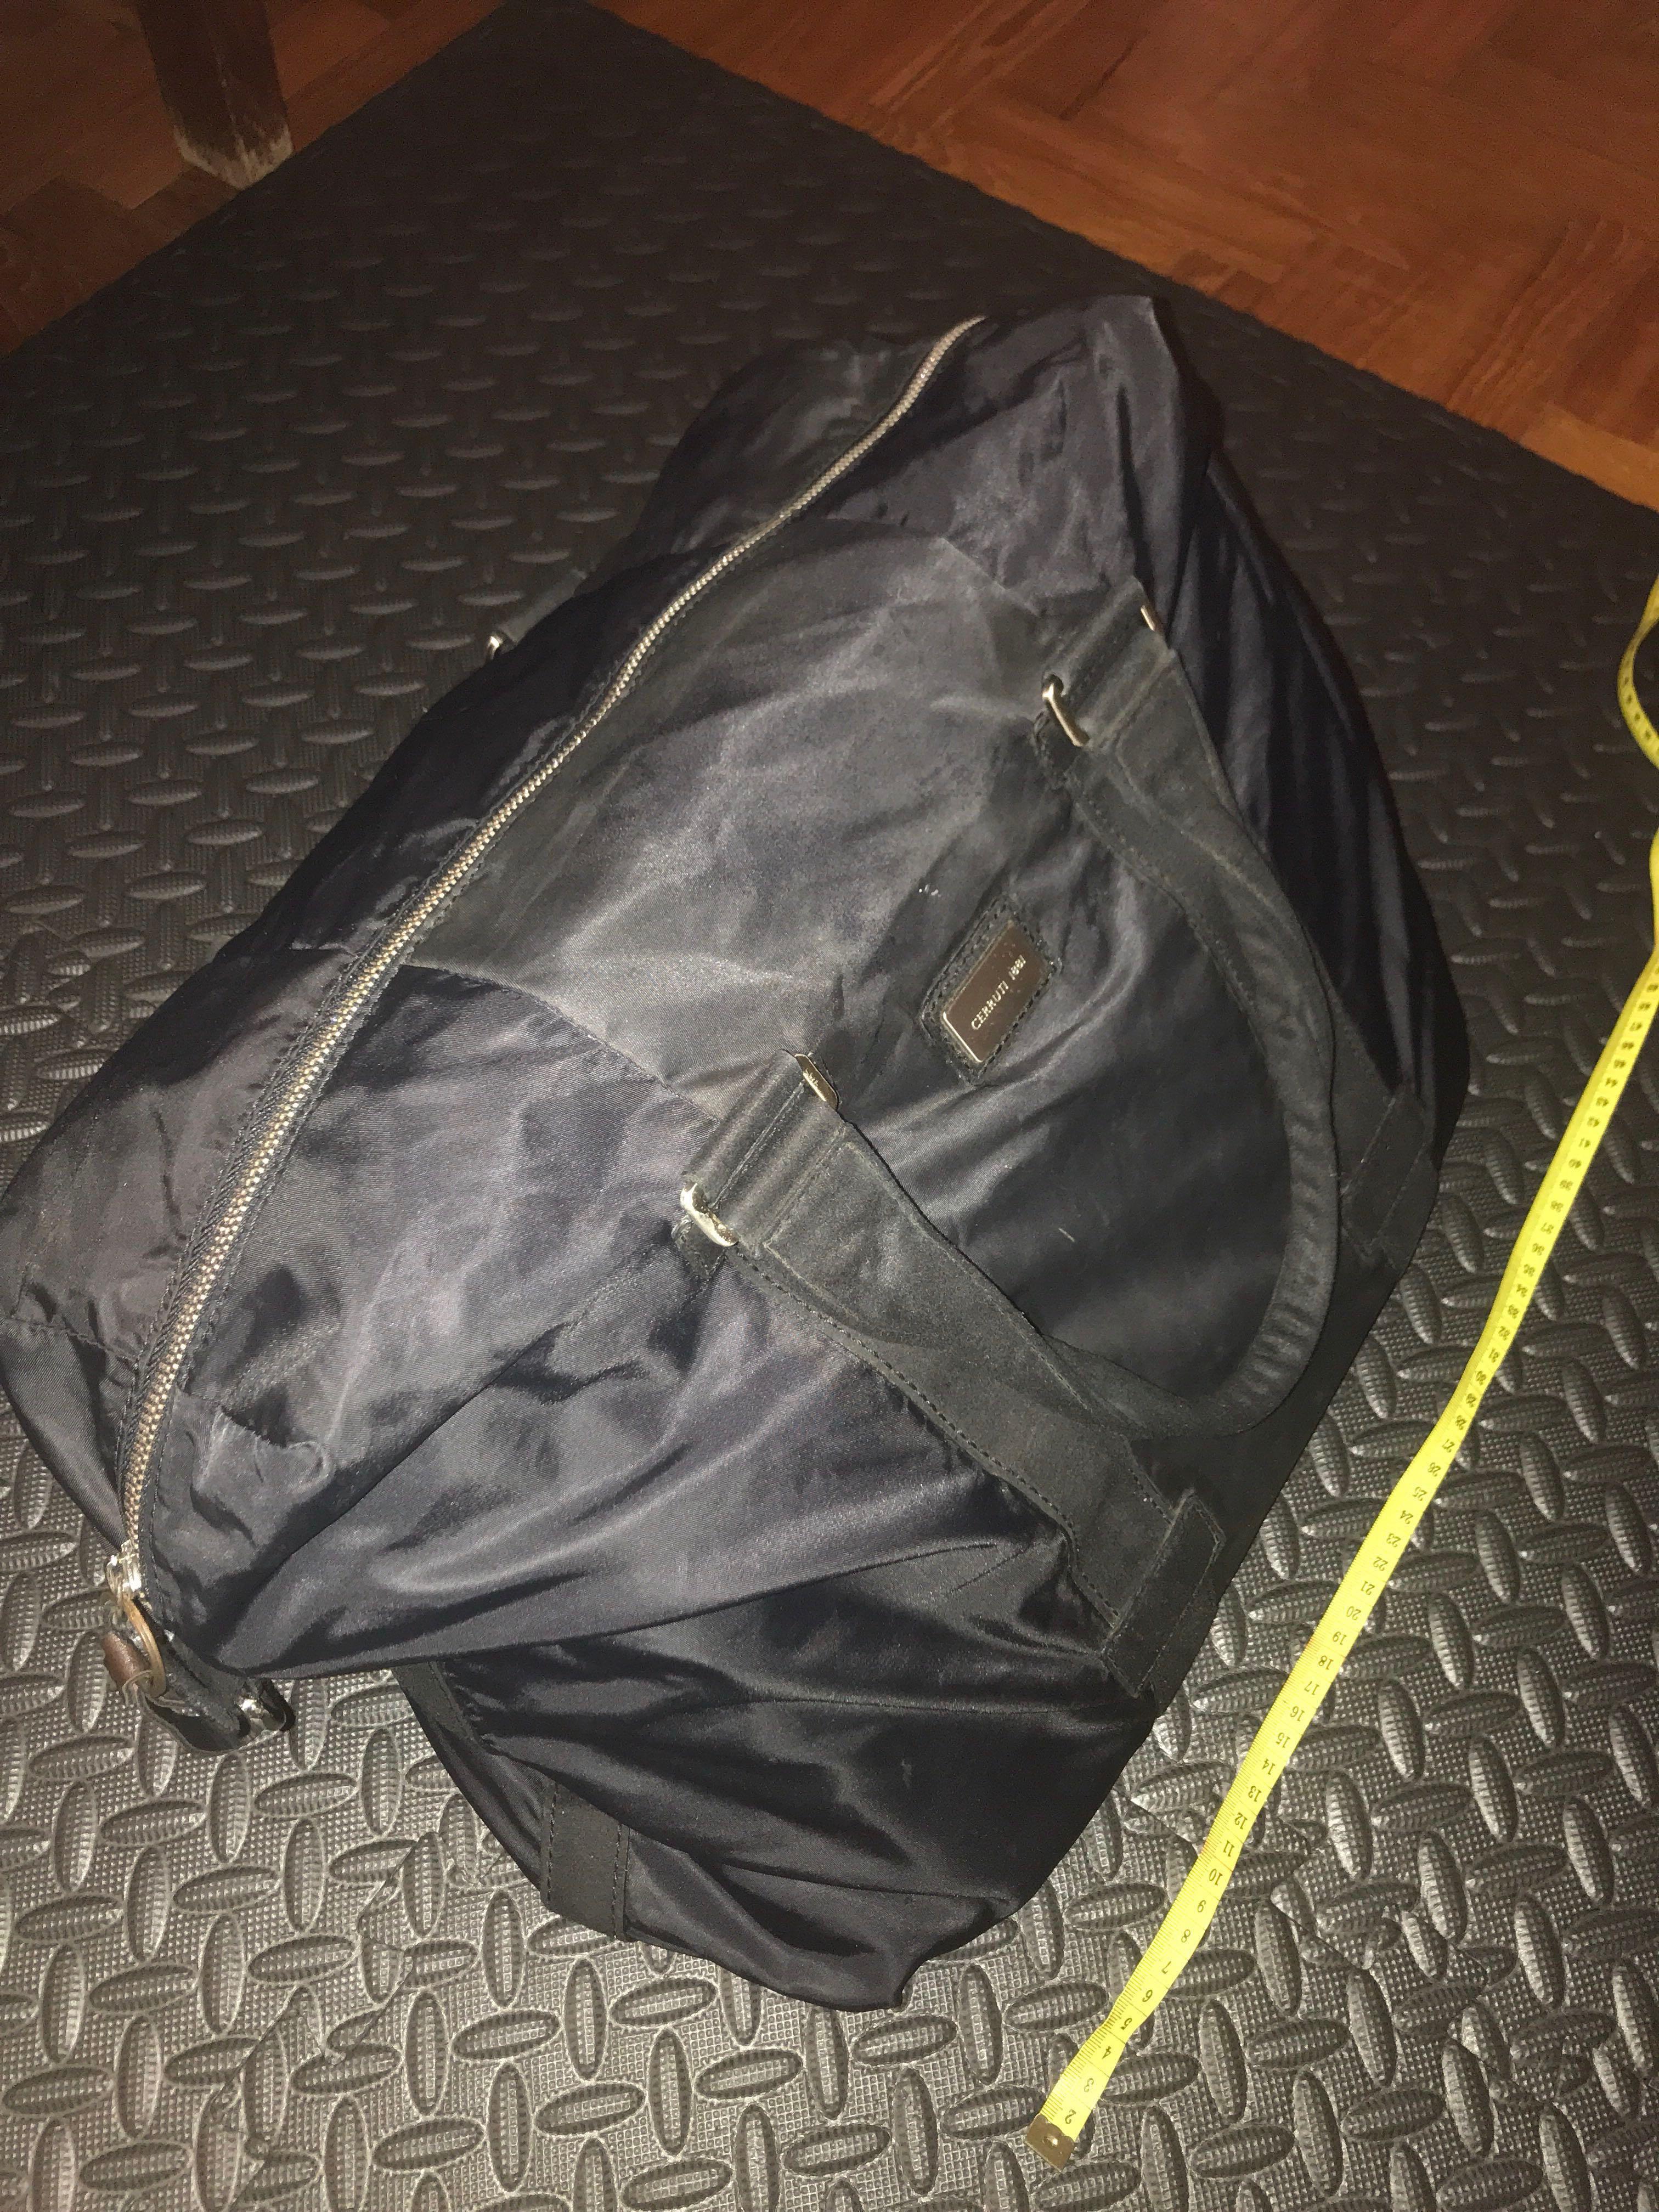 3842a7e311 Cerruti 1881 men tote bag / weekender bag, Men's Fashion, Bags & Wallets,  Backpacks on Carousell